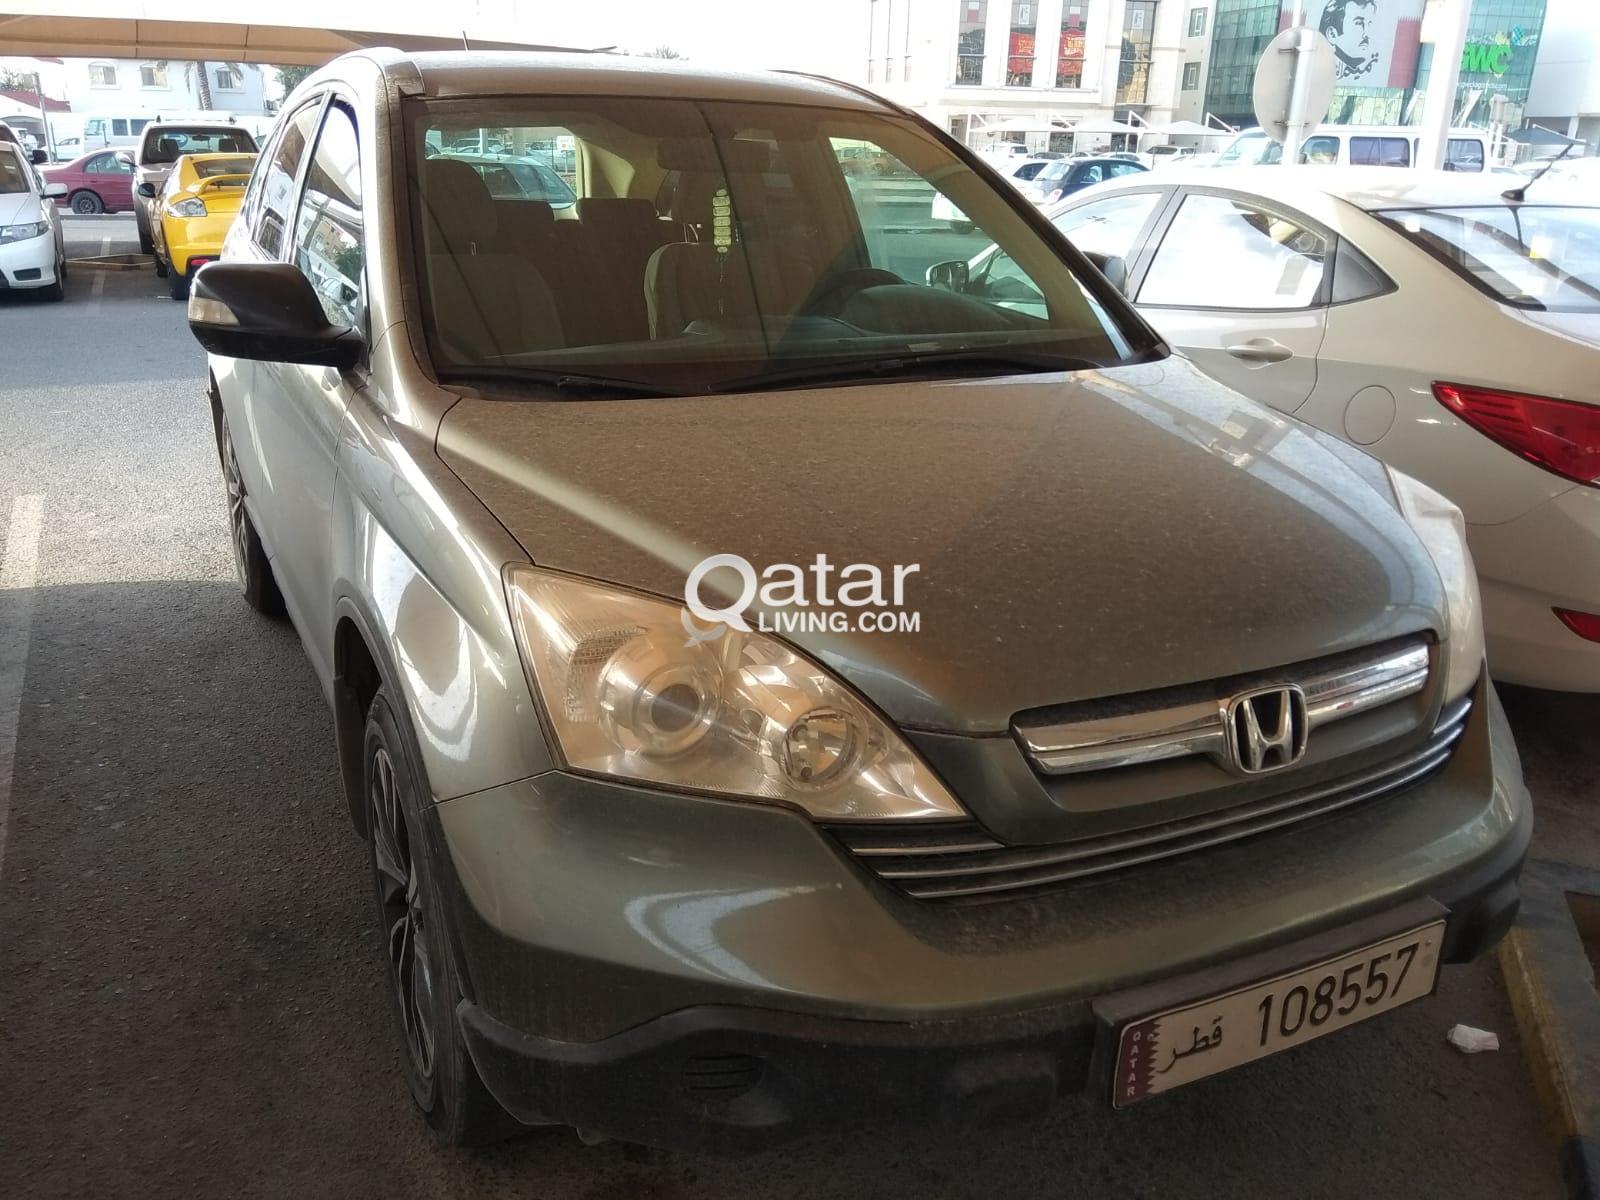 Honda Cr V 2007 For Sale Qatar Living